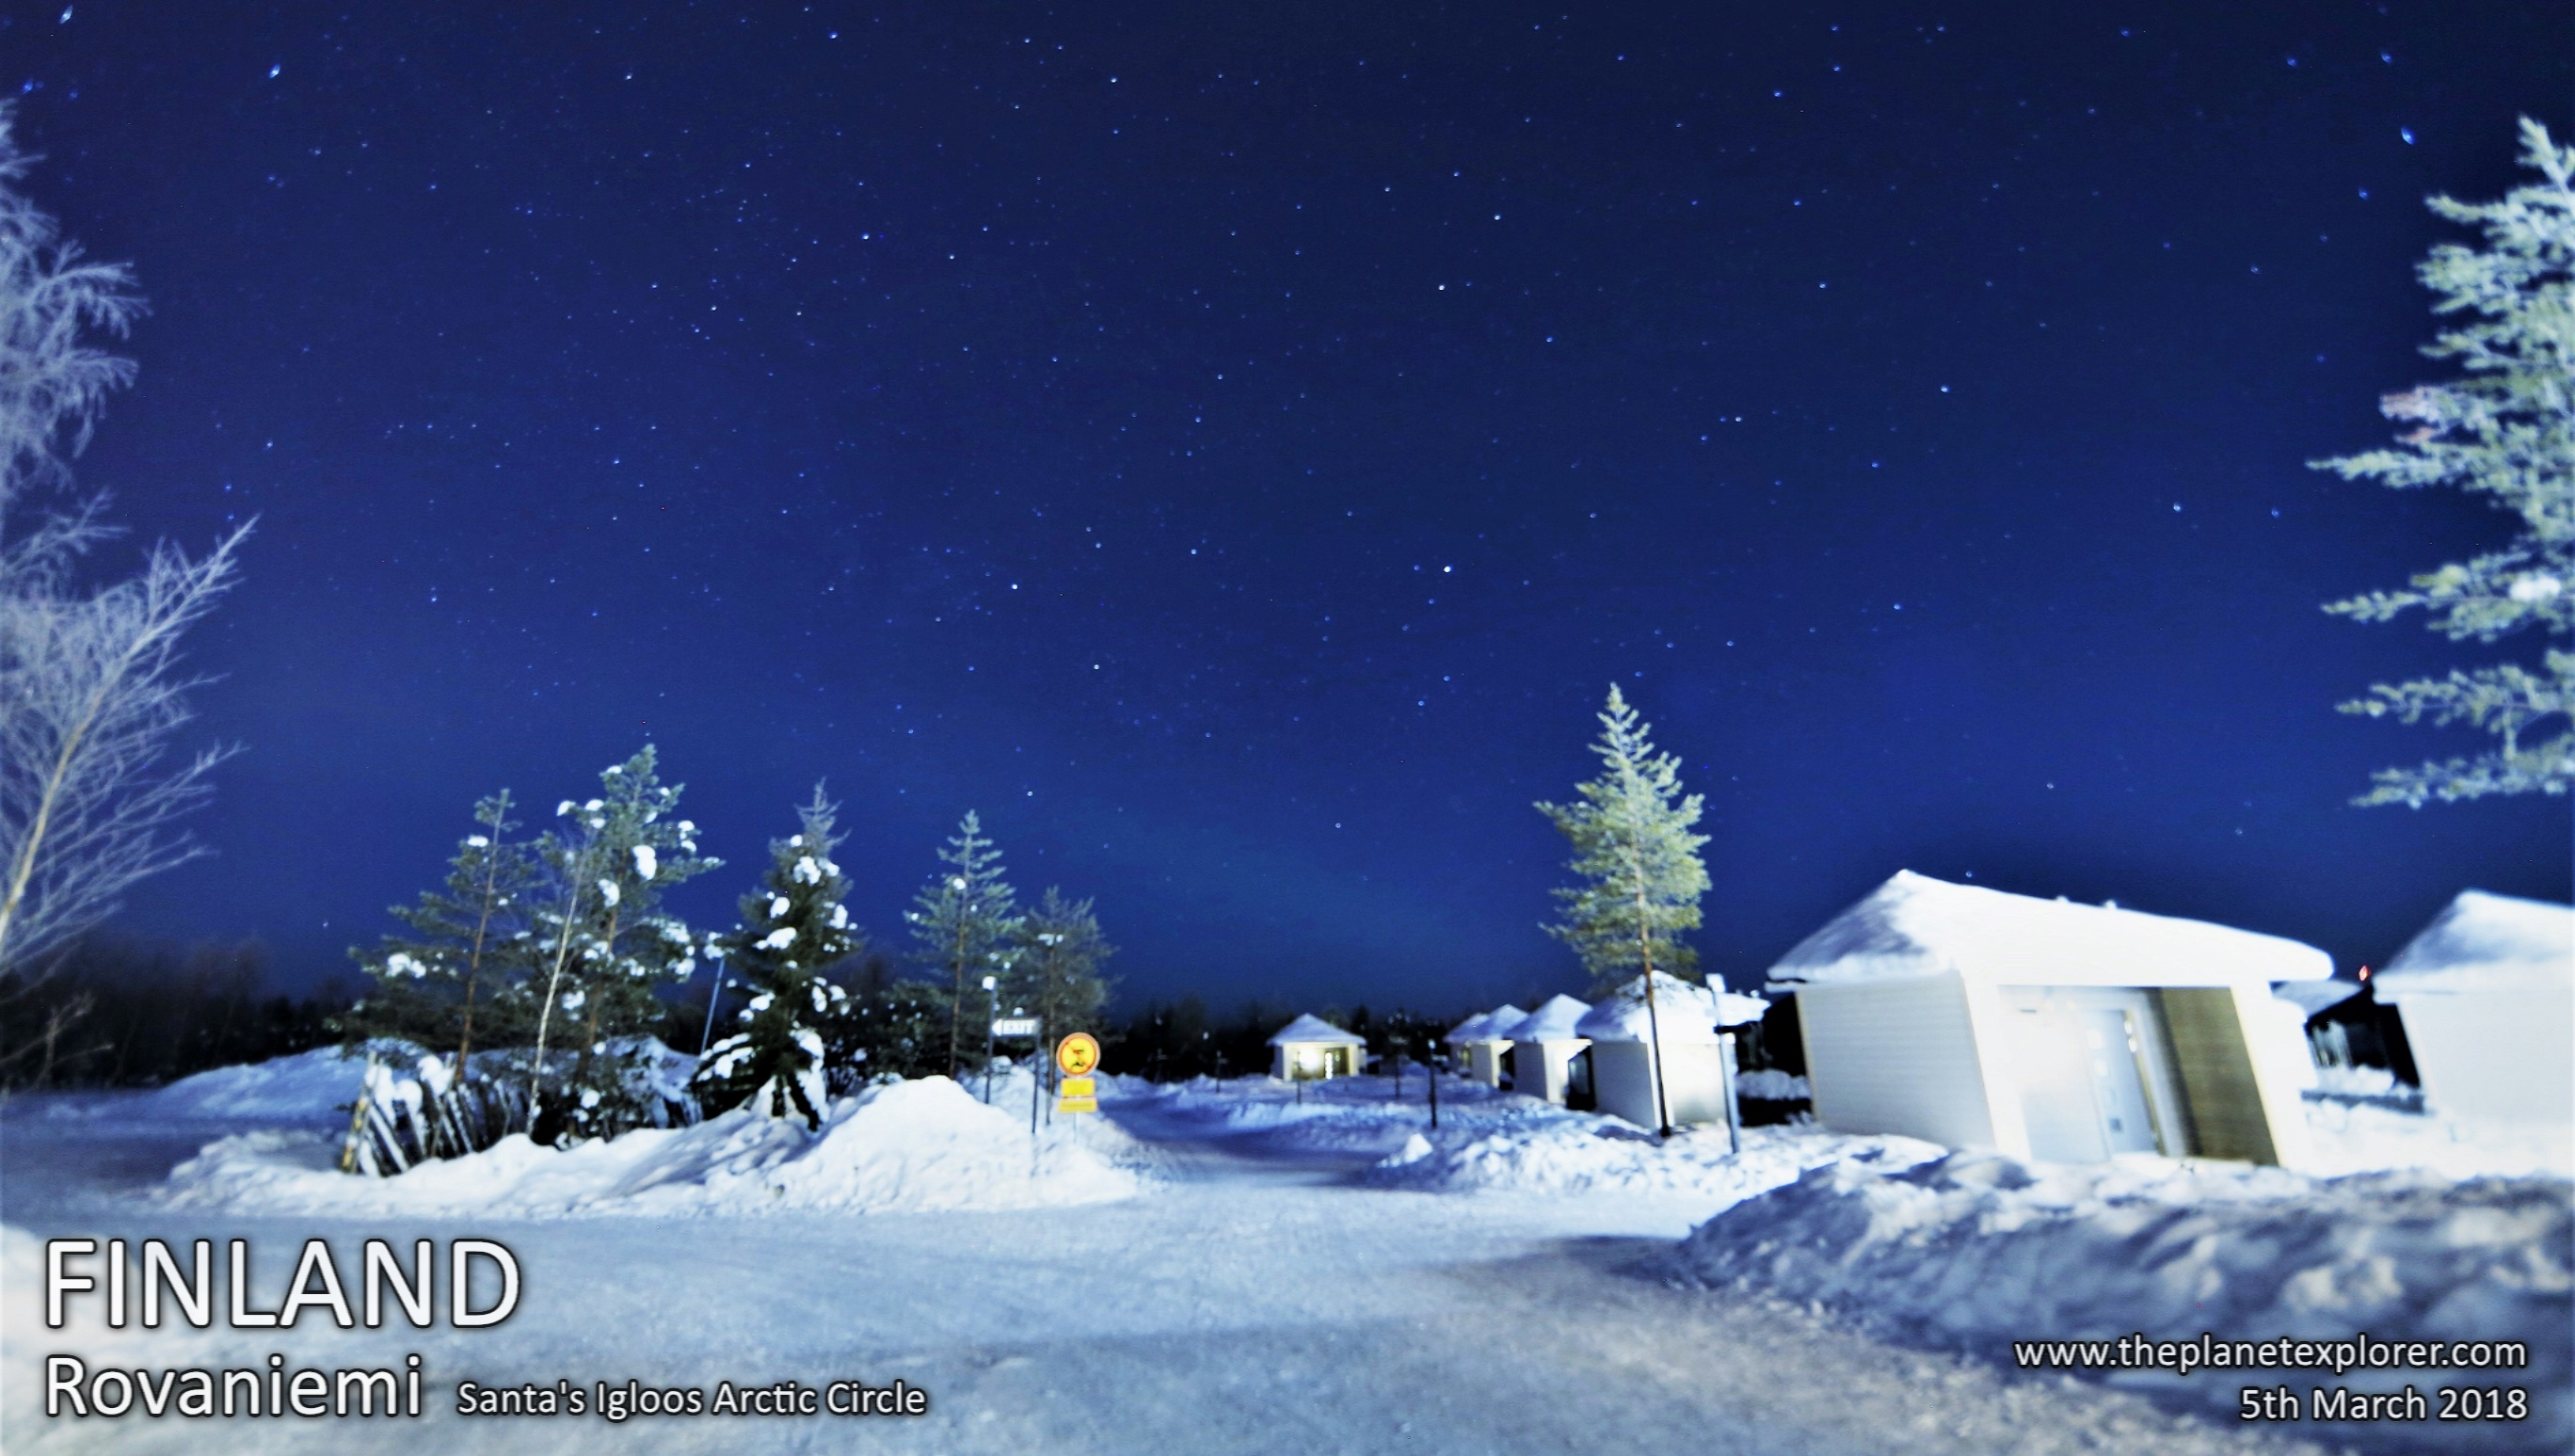 20180305_2359_Finland_Rovaniemi_Santa's Igloos Artic Circle_Q03A9735_Canon 5DMk3_LR_@www